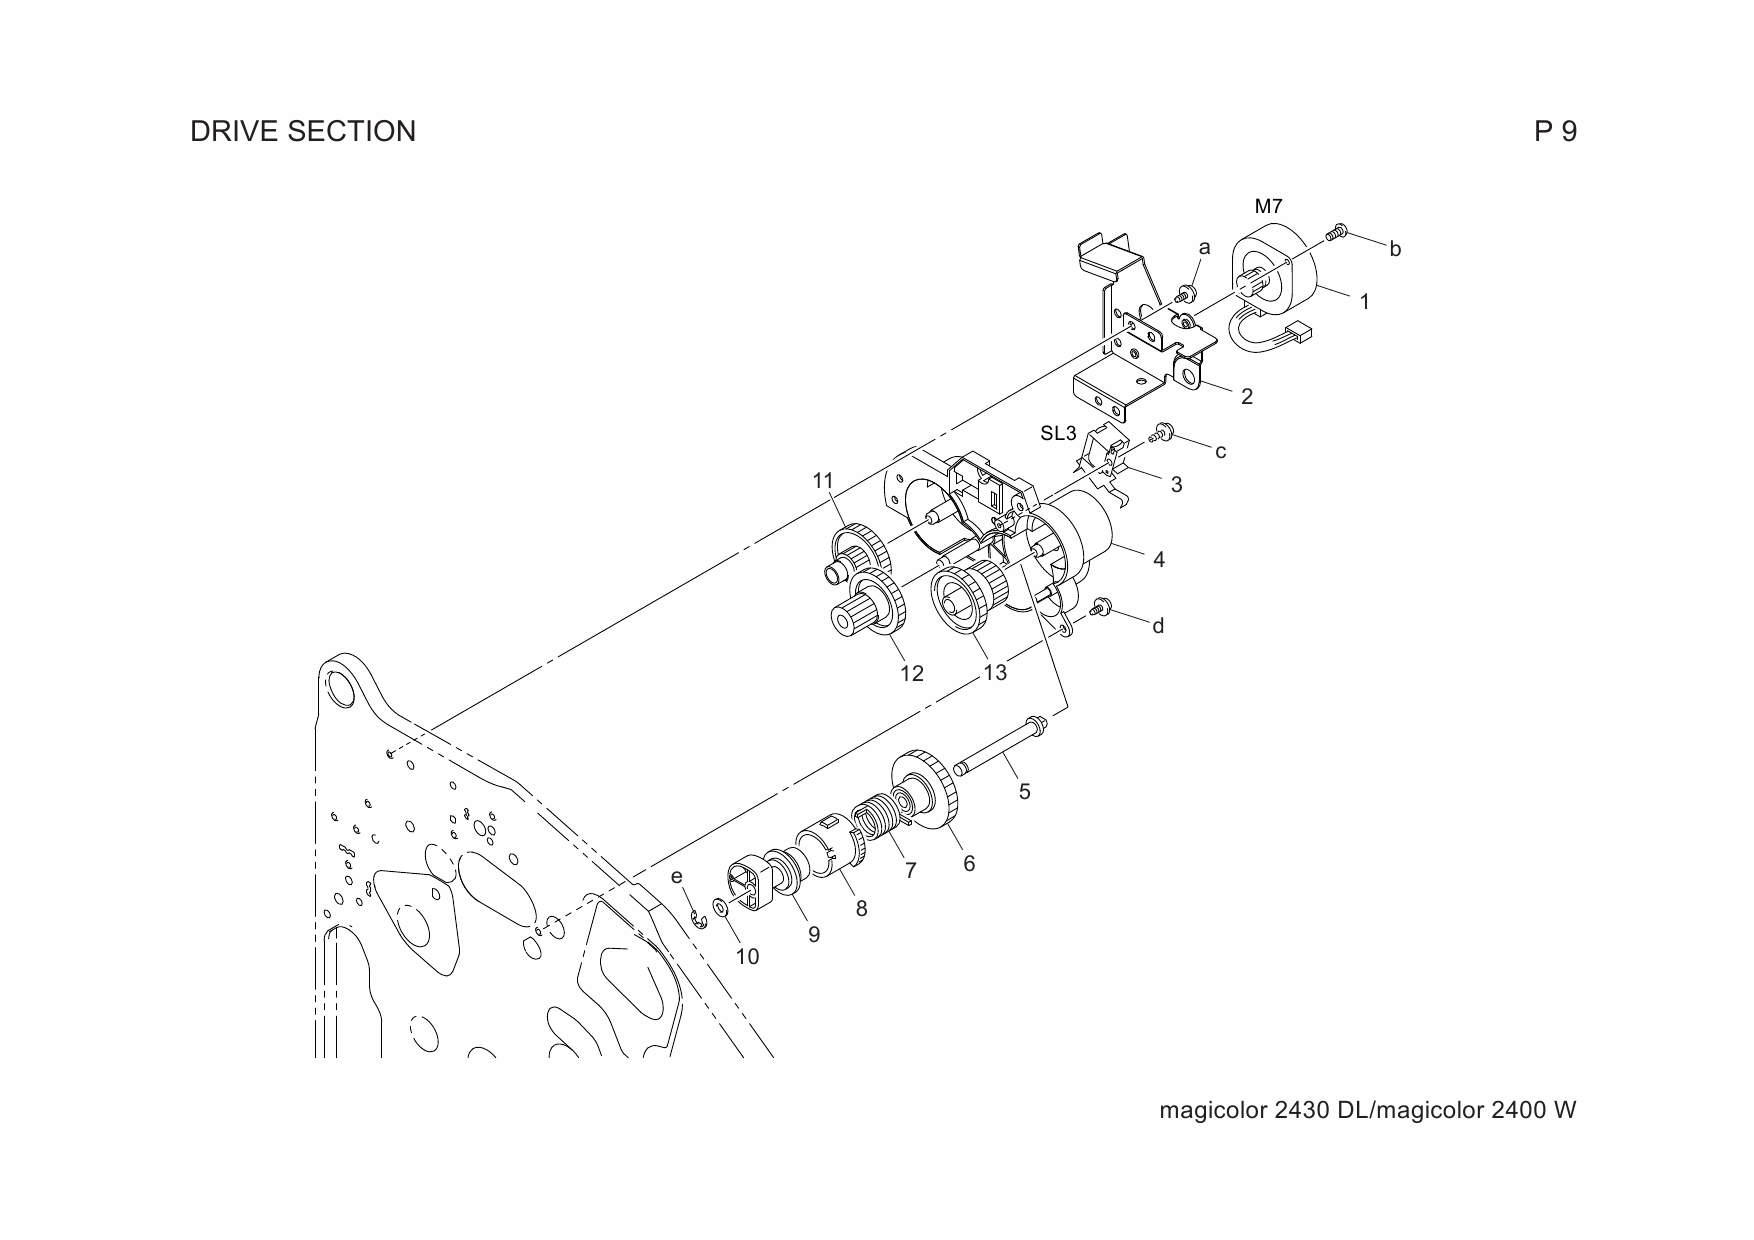 konica minolta 2400w repair manual